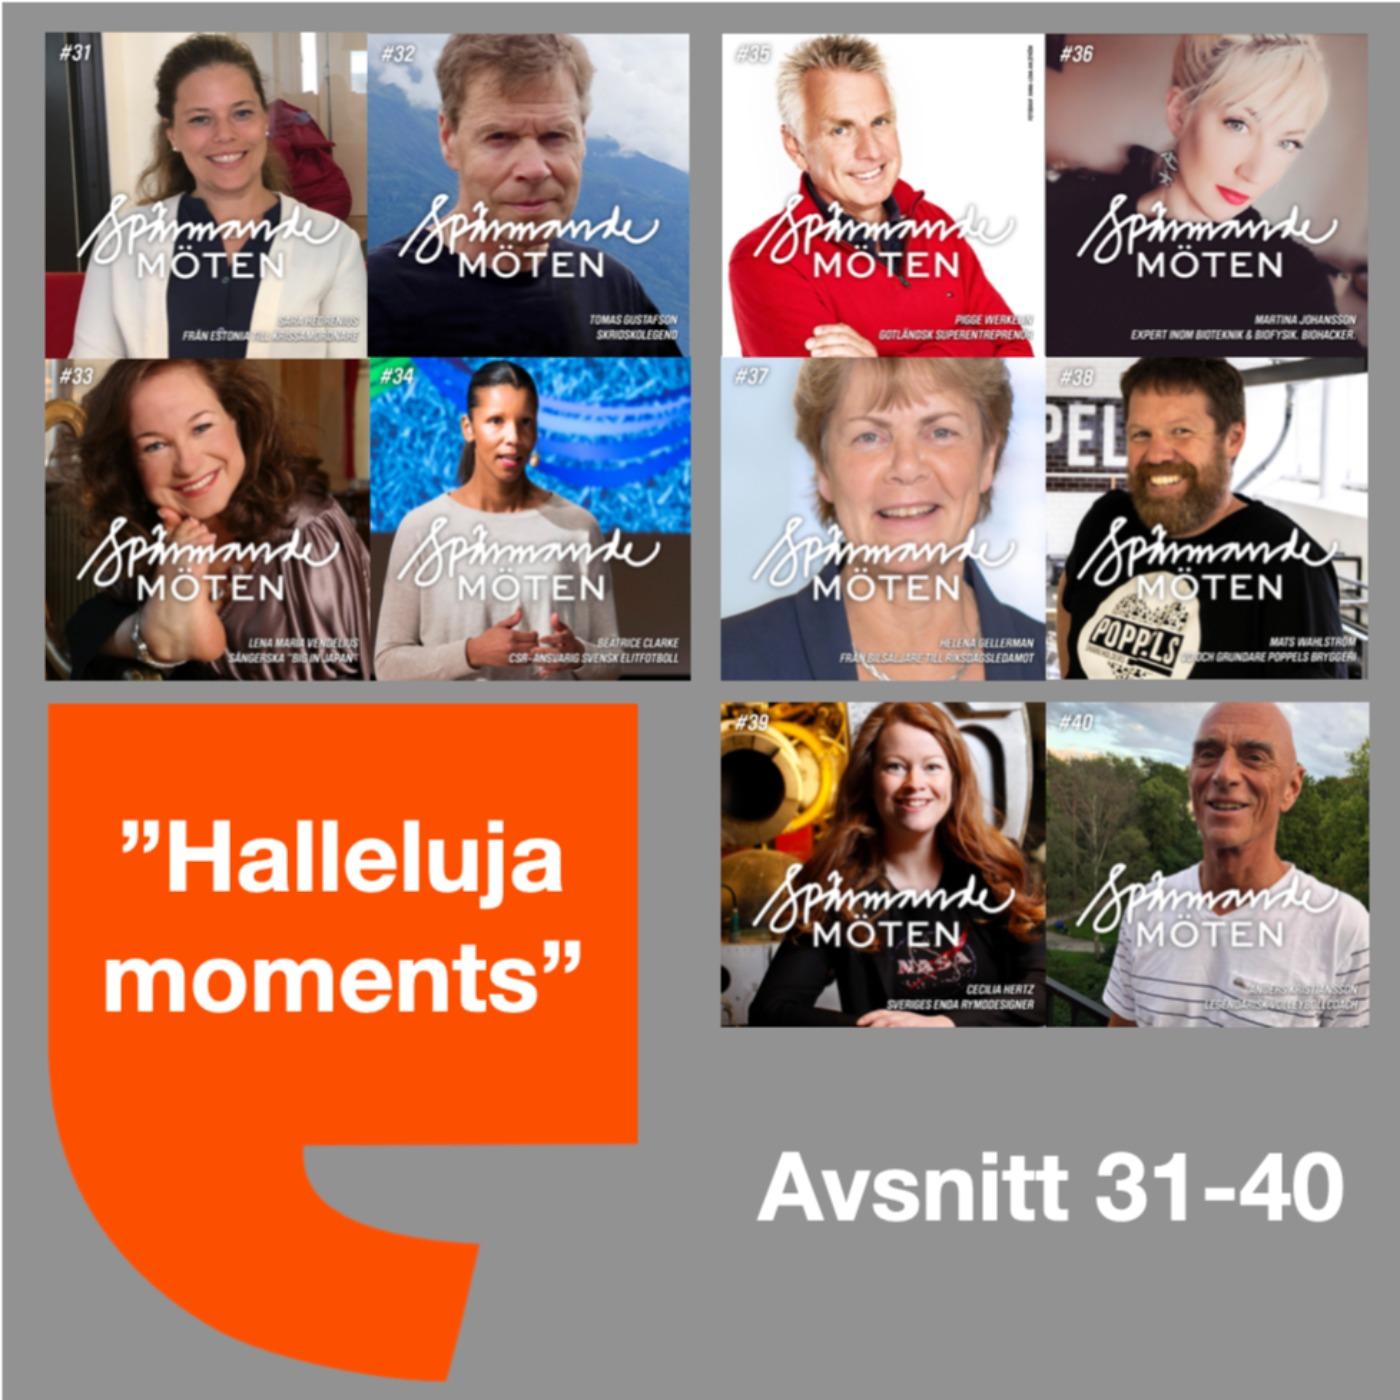 Halleluja moments avsnitt 31-40